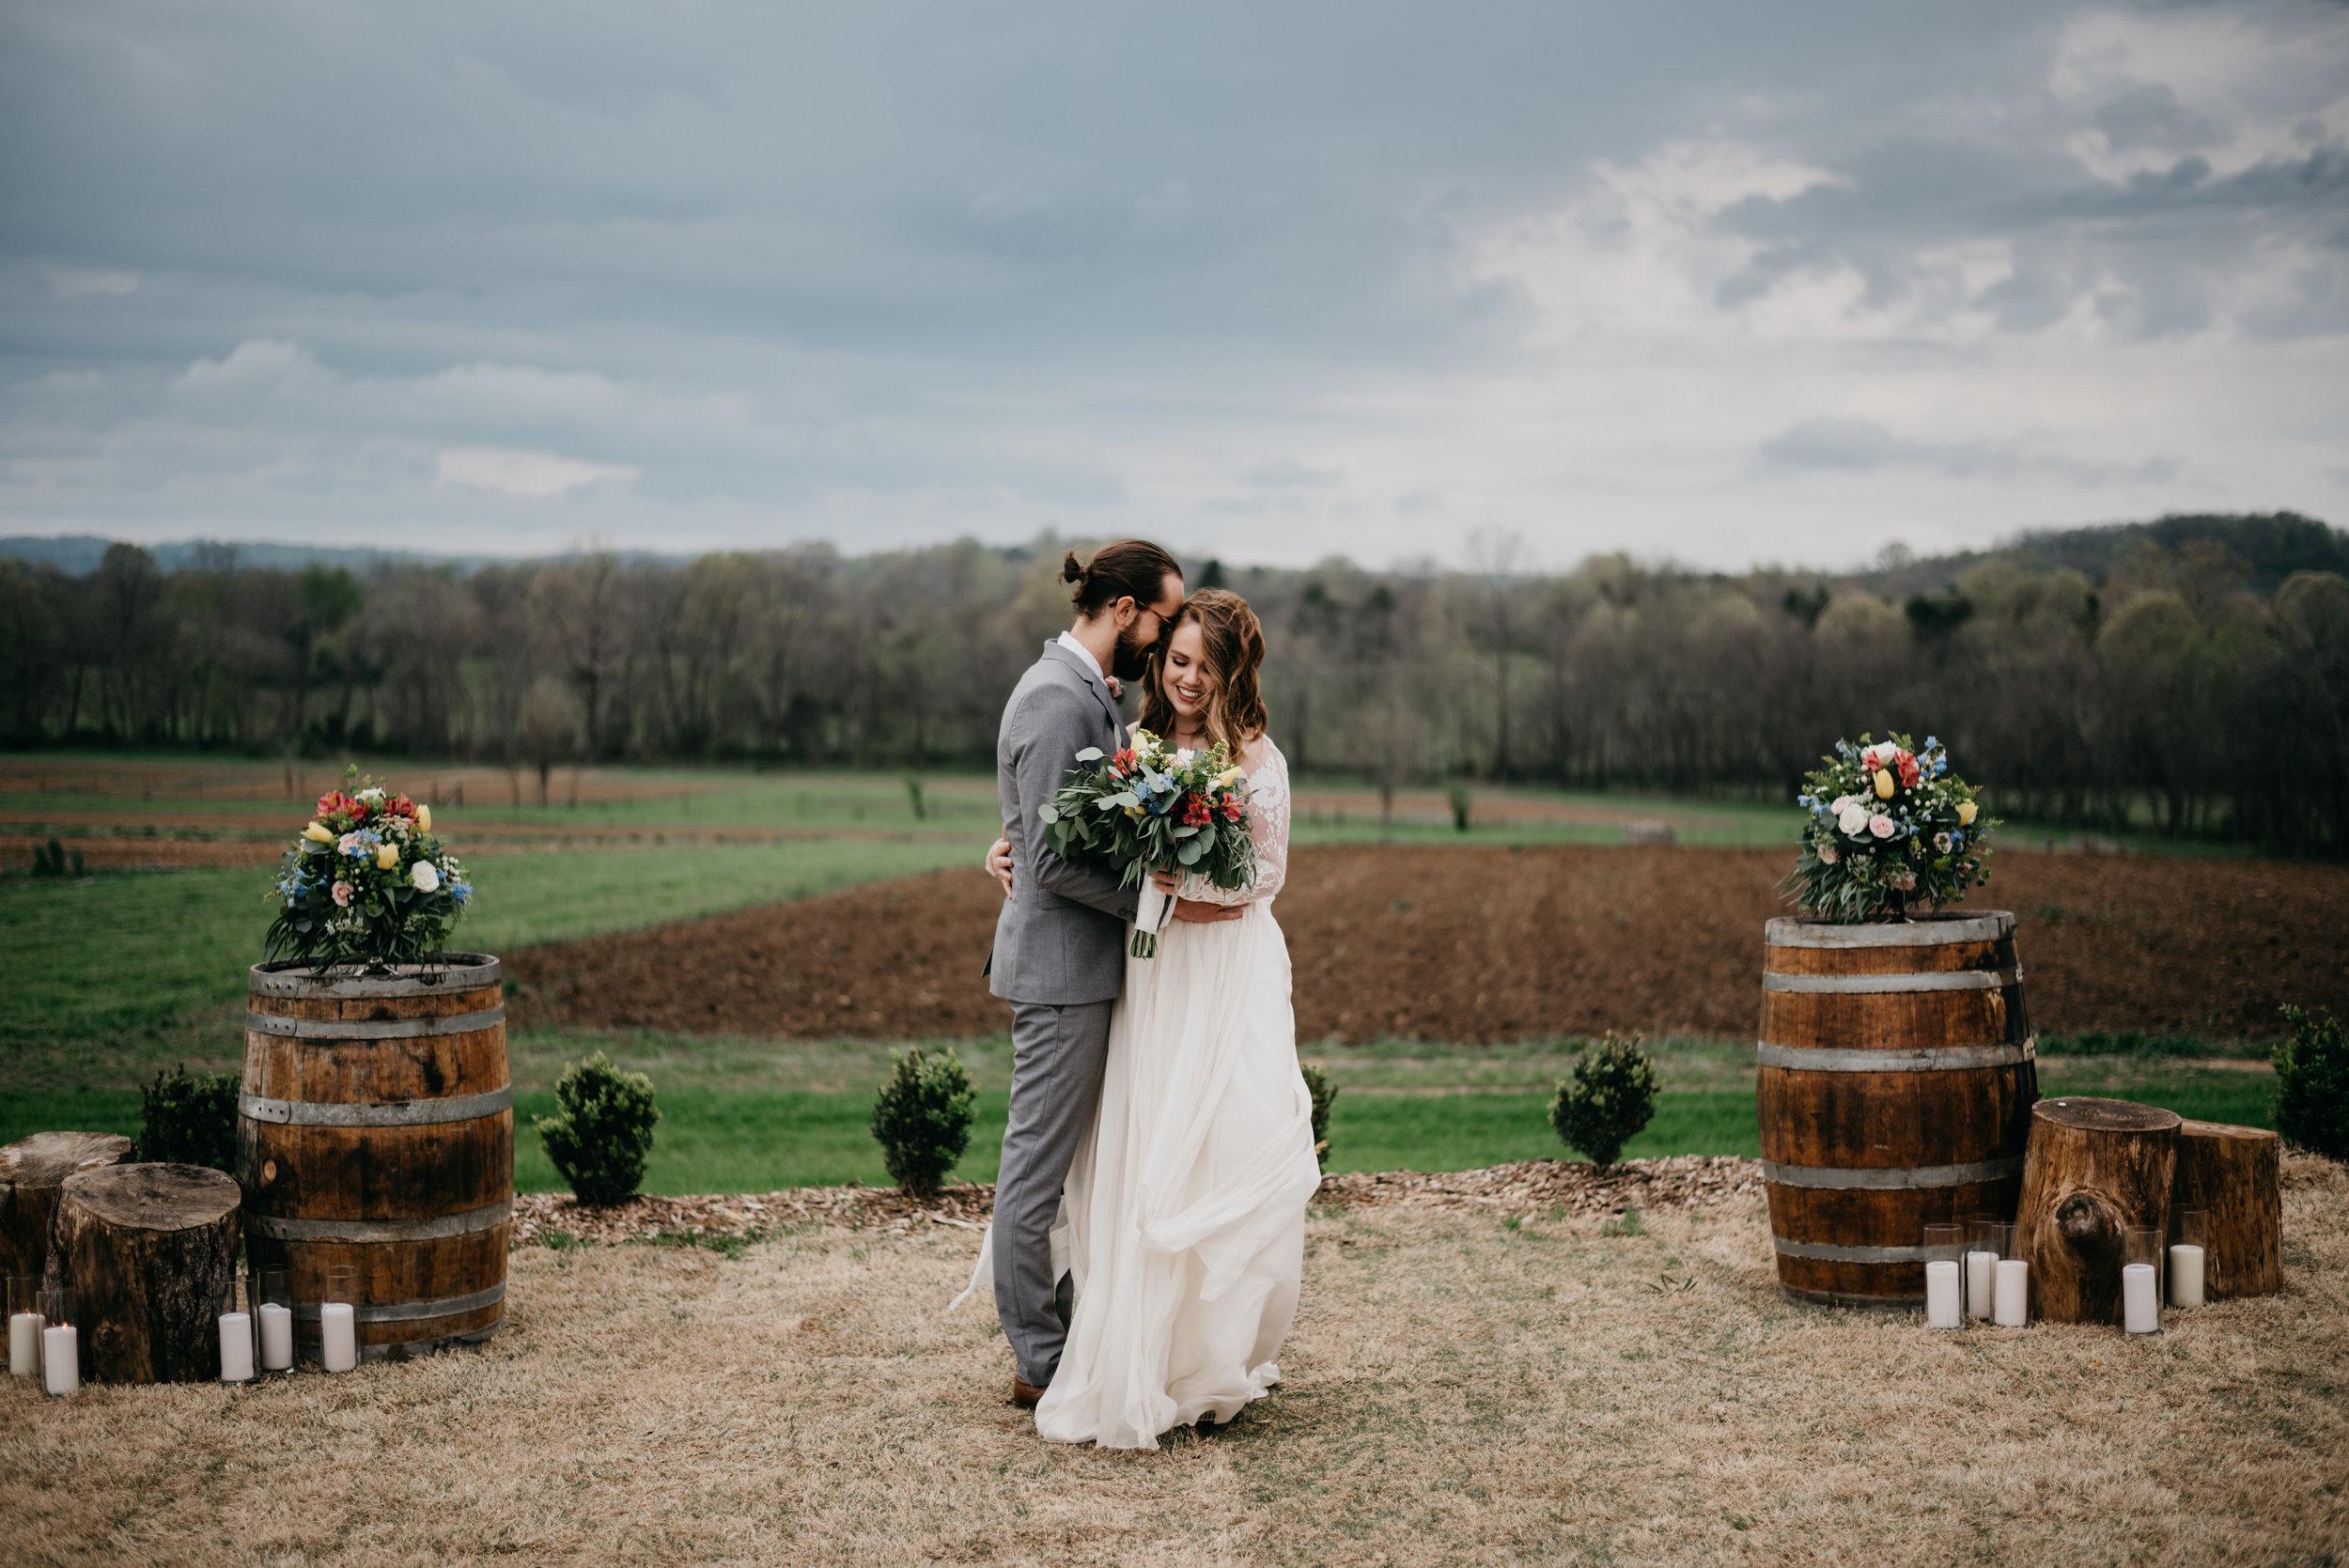 Allenbrooke-Farms-Nashville-Wedding-Photographers 3.jpg